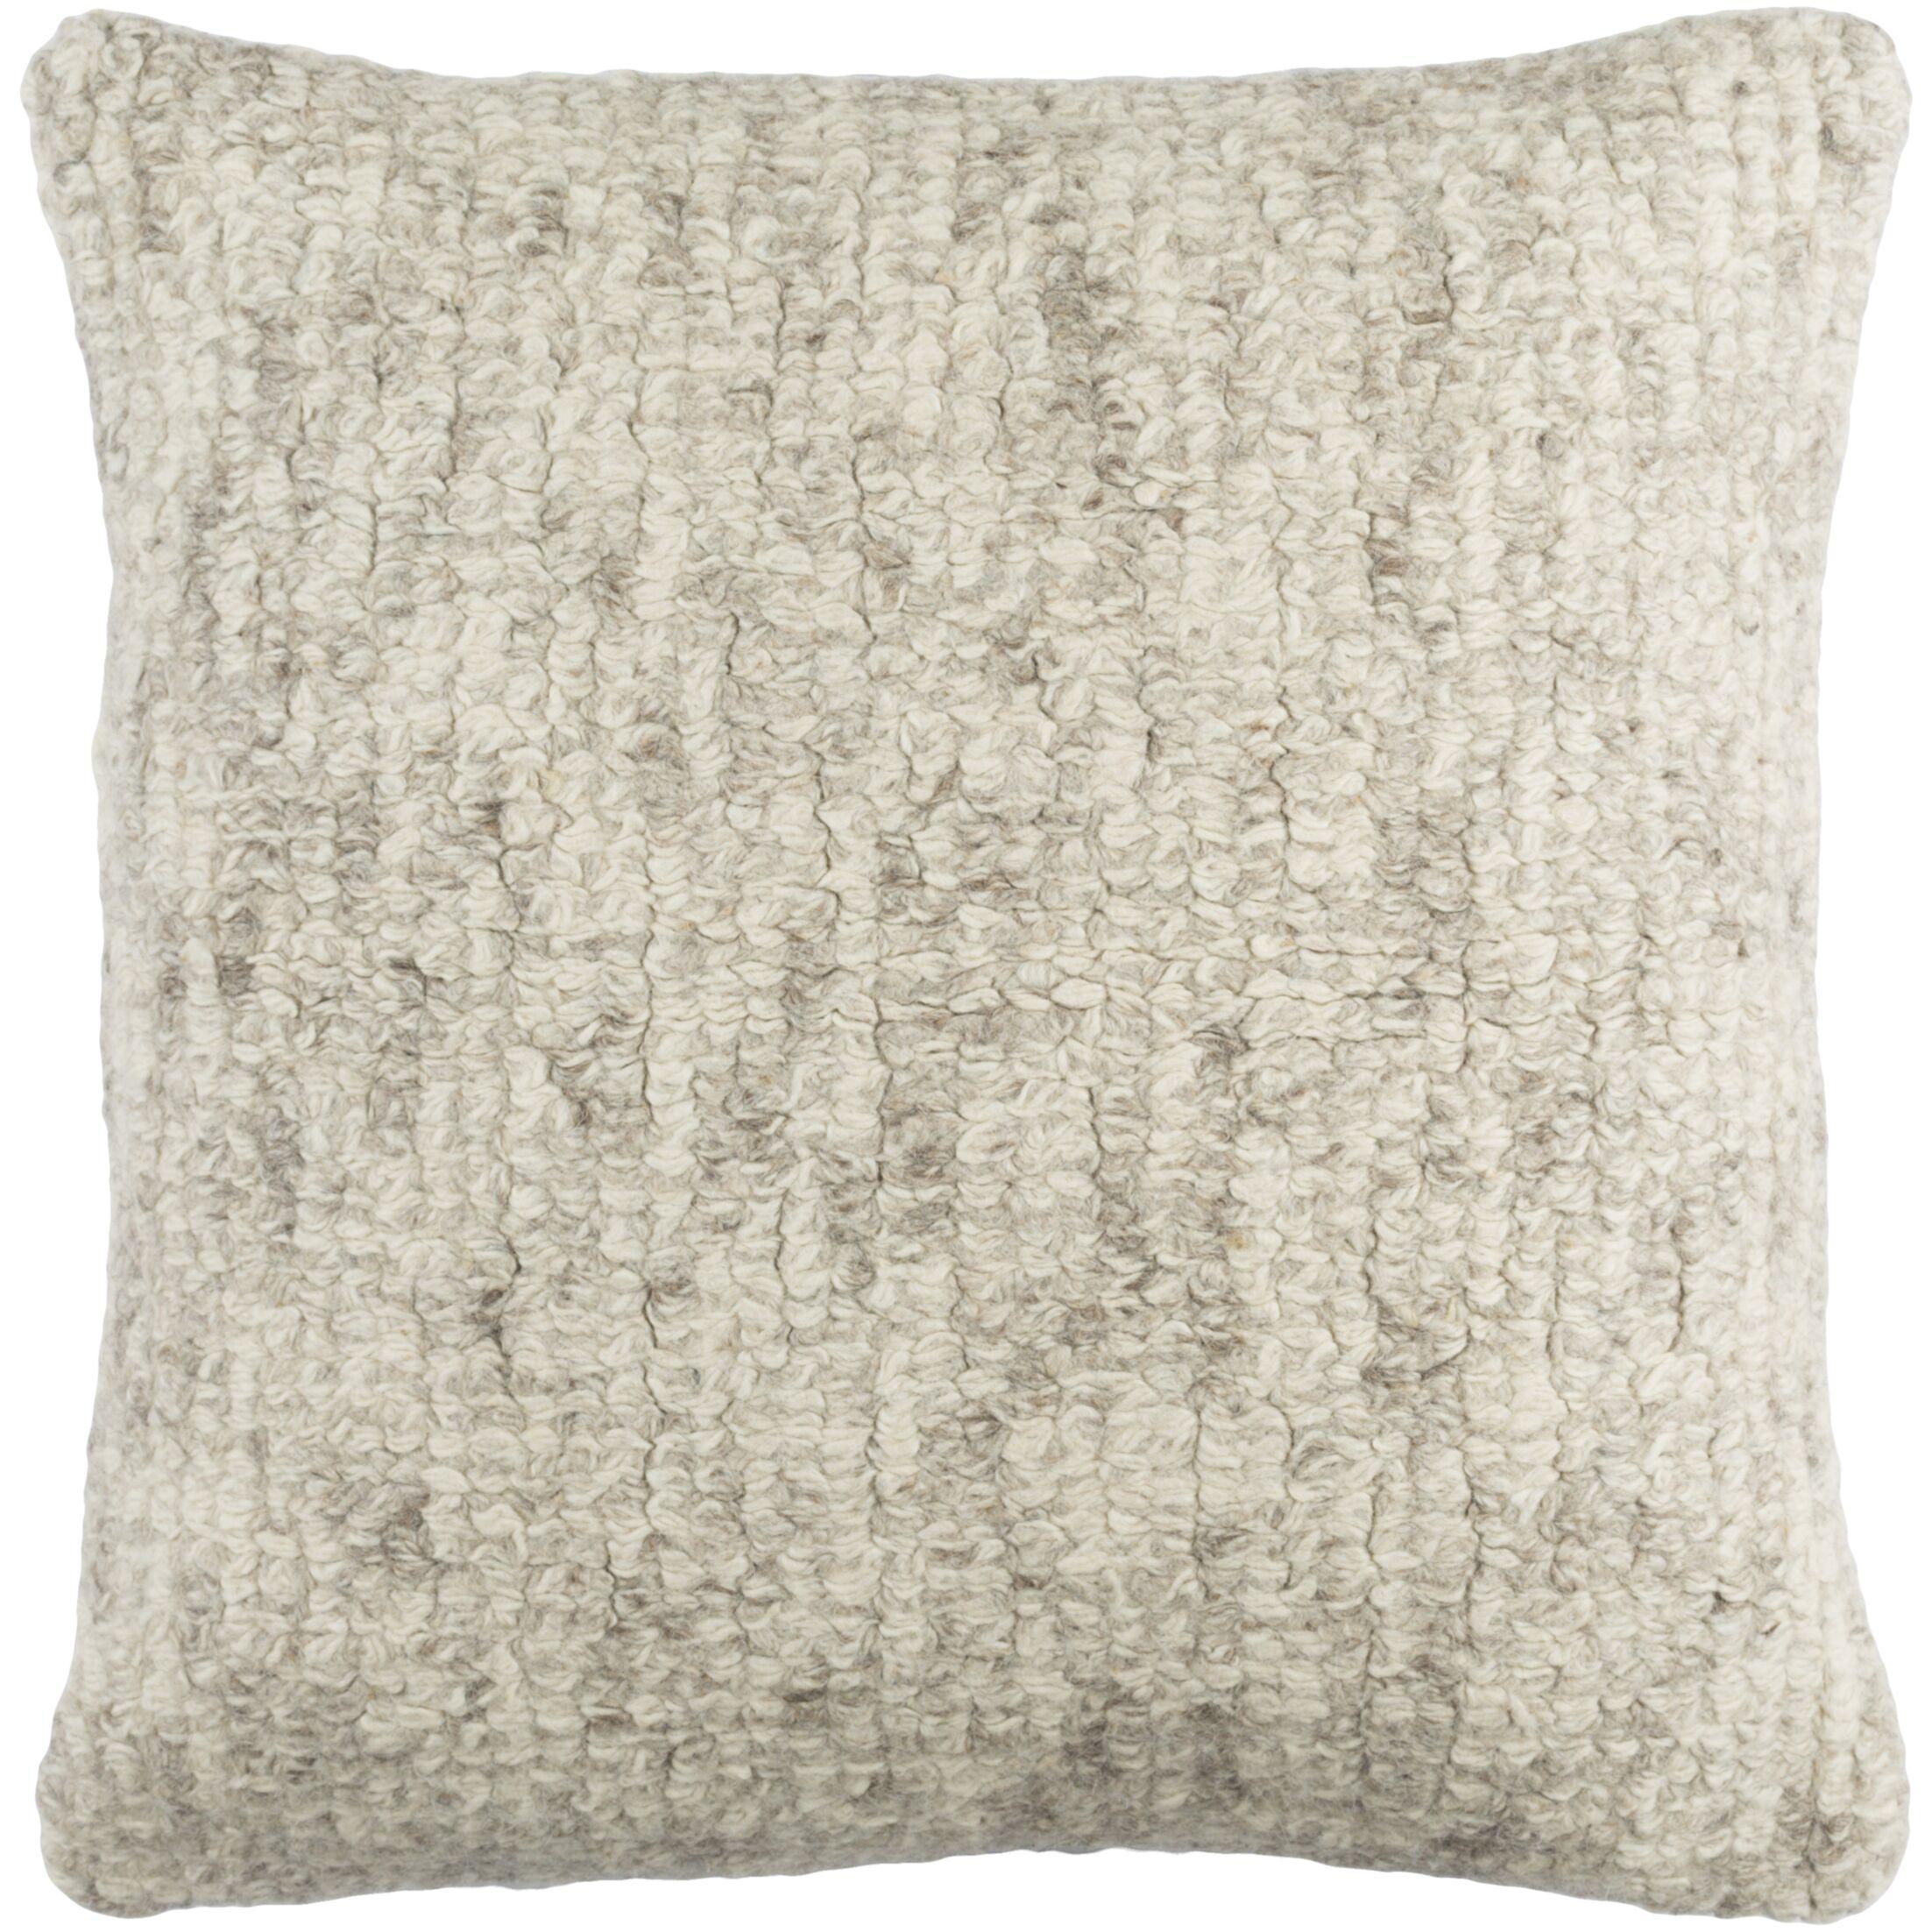 Agathon Wool Throw Pillow Color: Cream/Medium Gray/Taupe